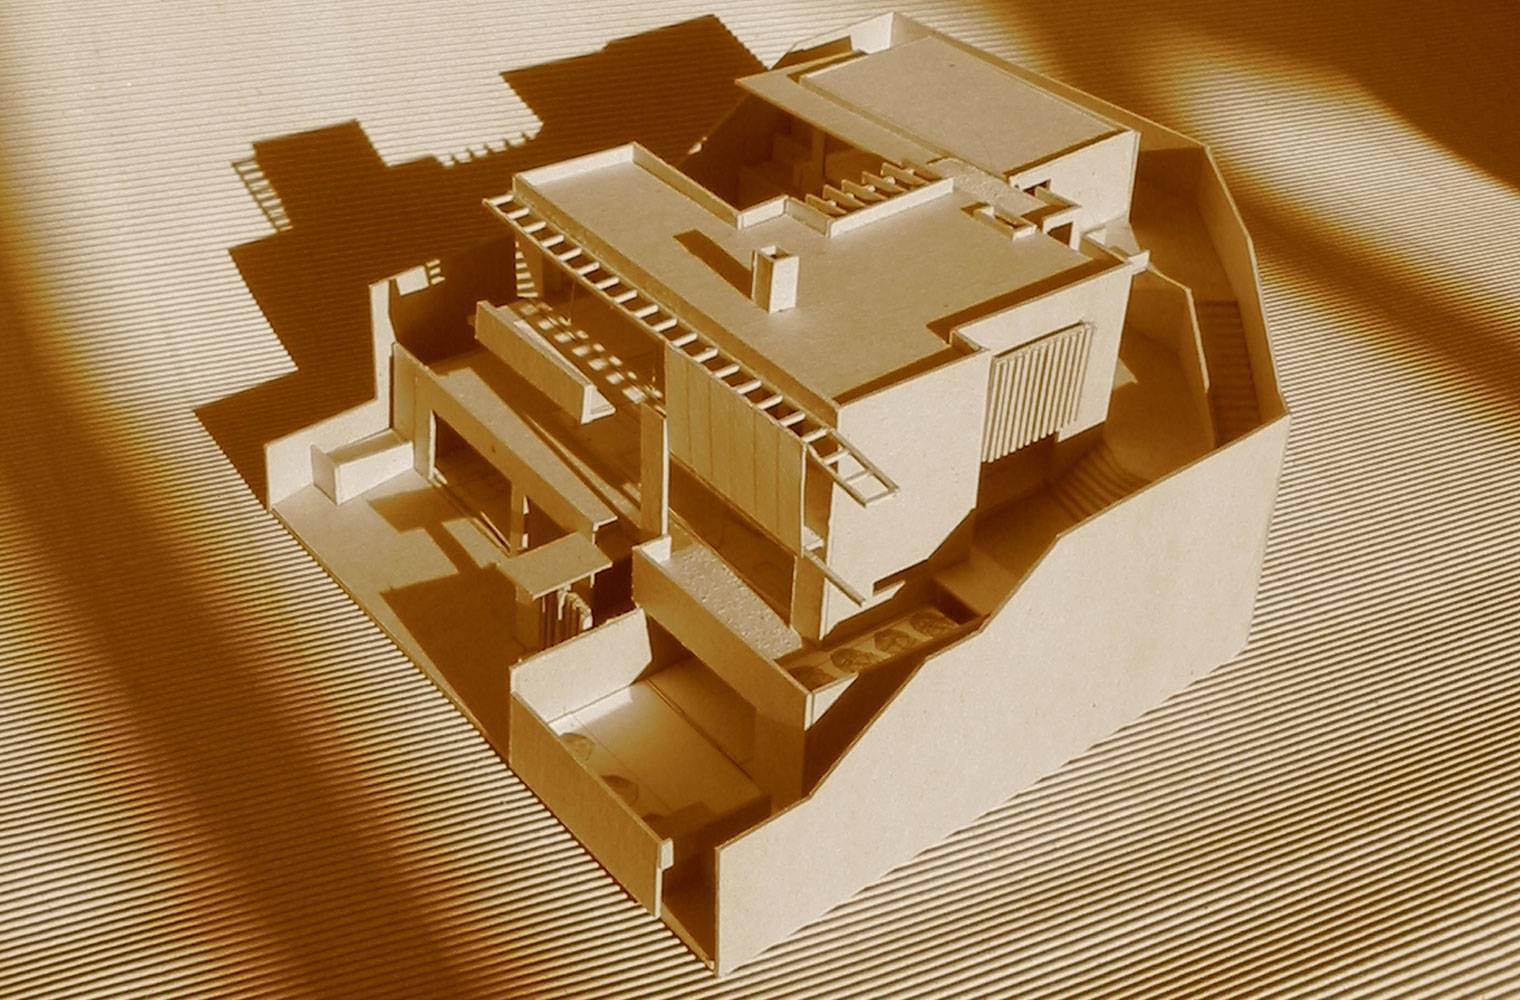 House Ferraz - Concept Model